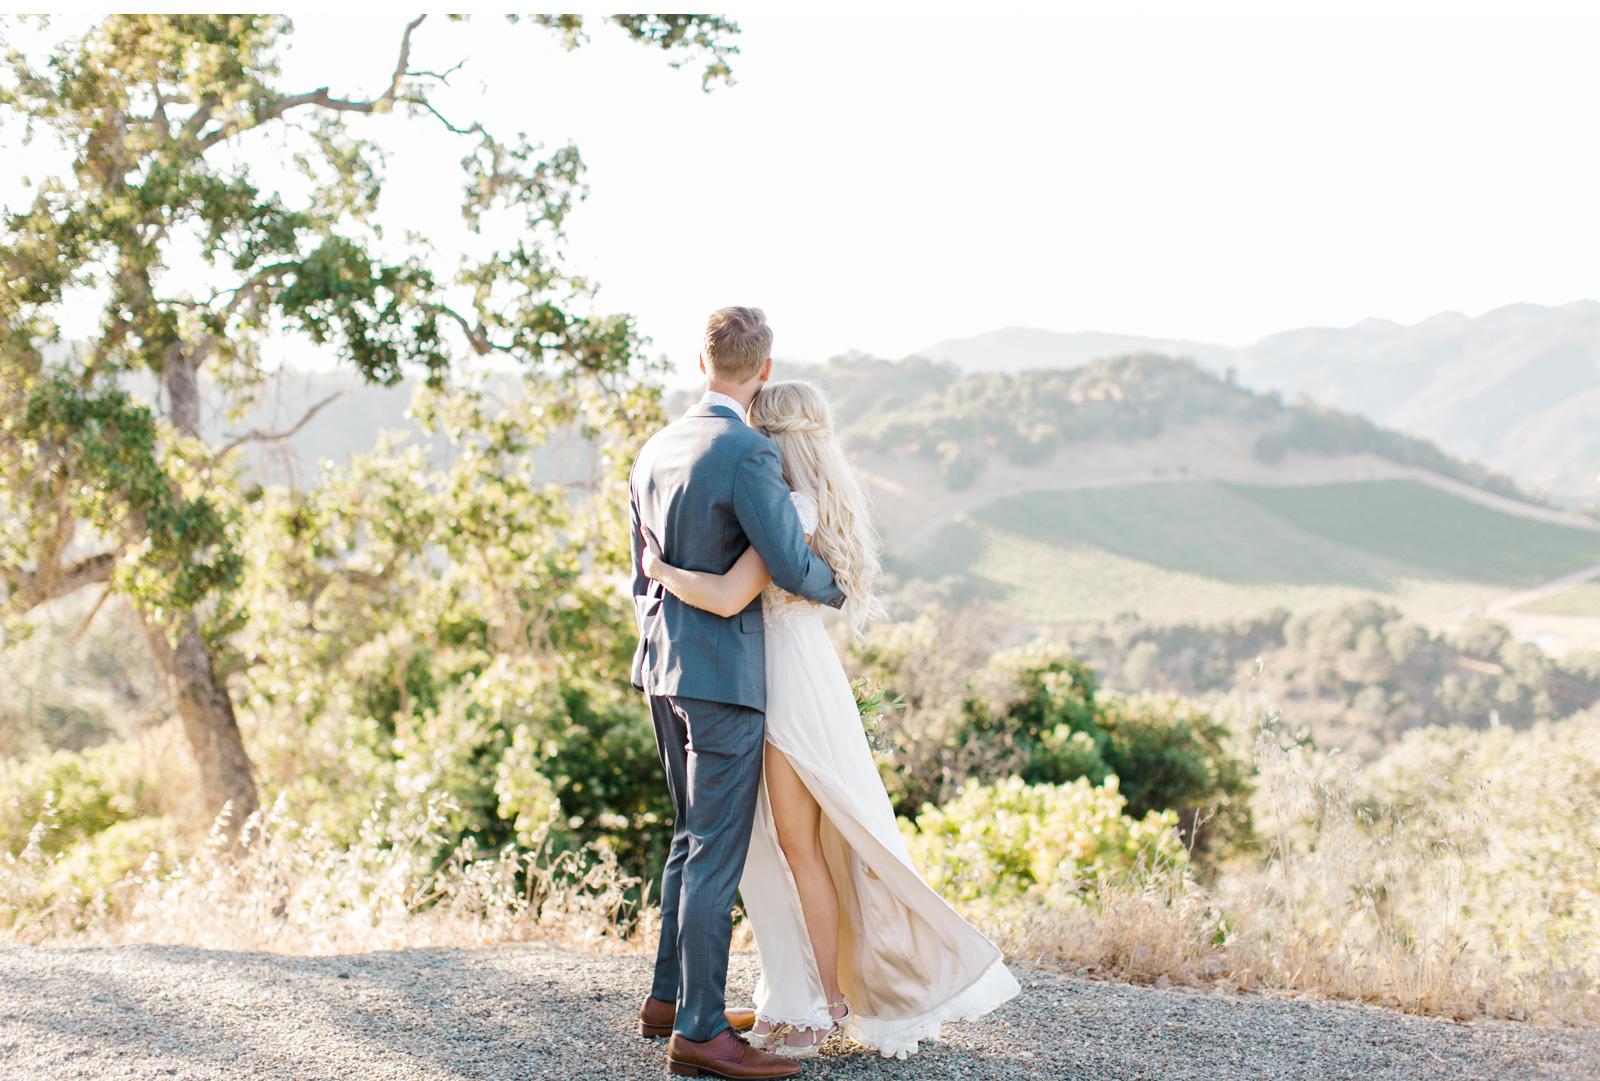 Natalie-Schutt-Photography's-Wedding-Style-Me-Pretty-Paso-Robles_13.jpg